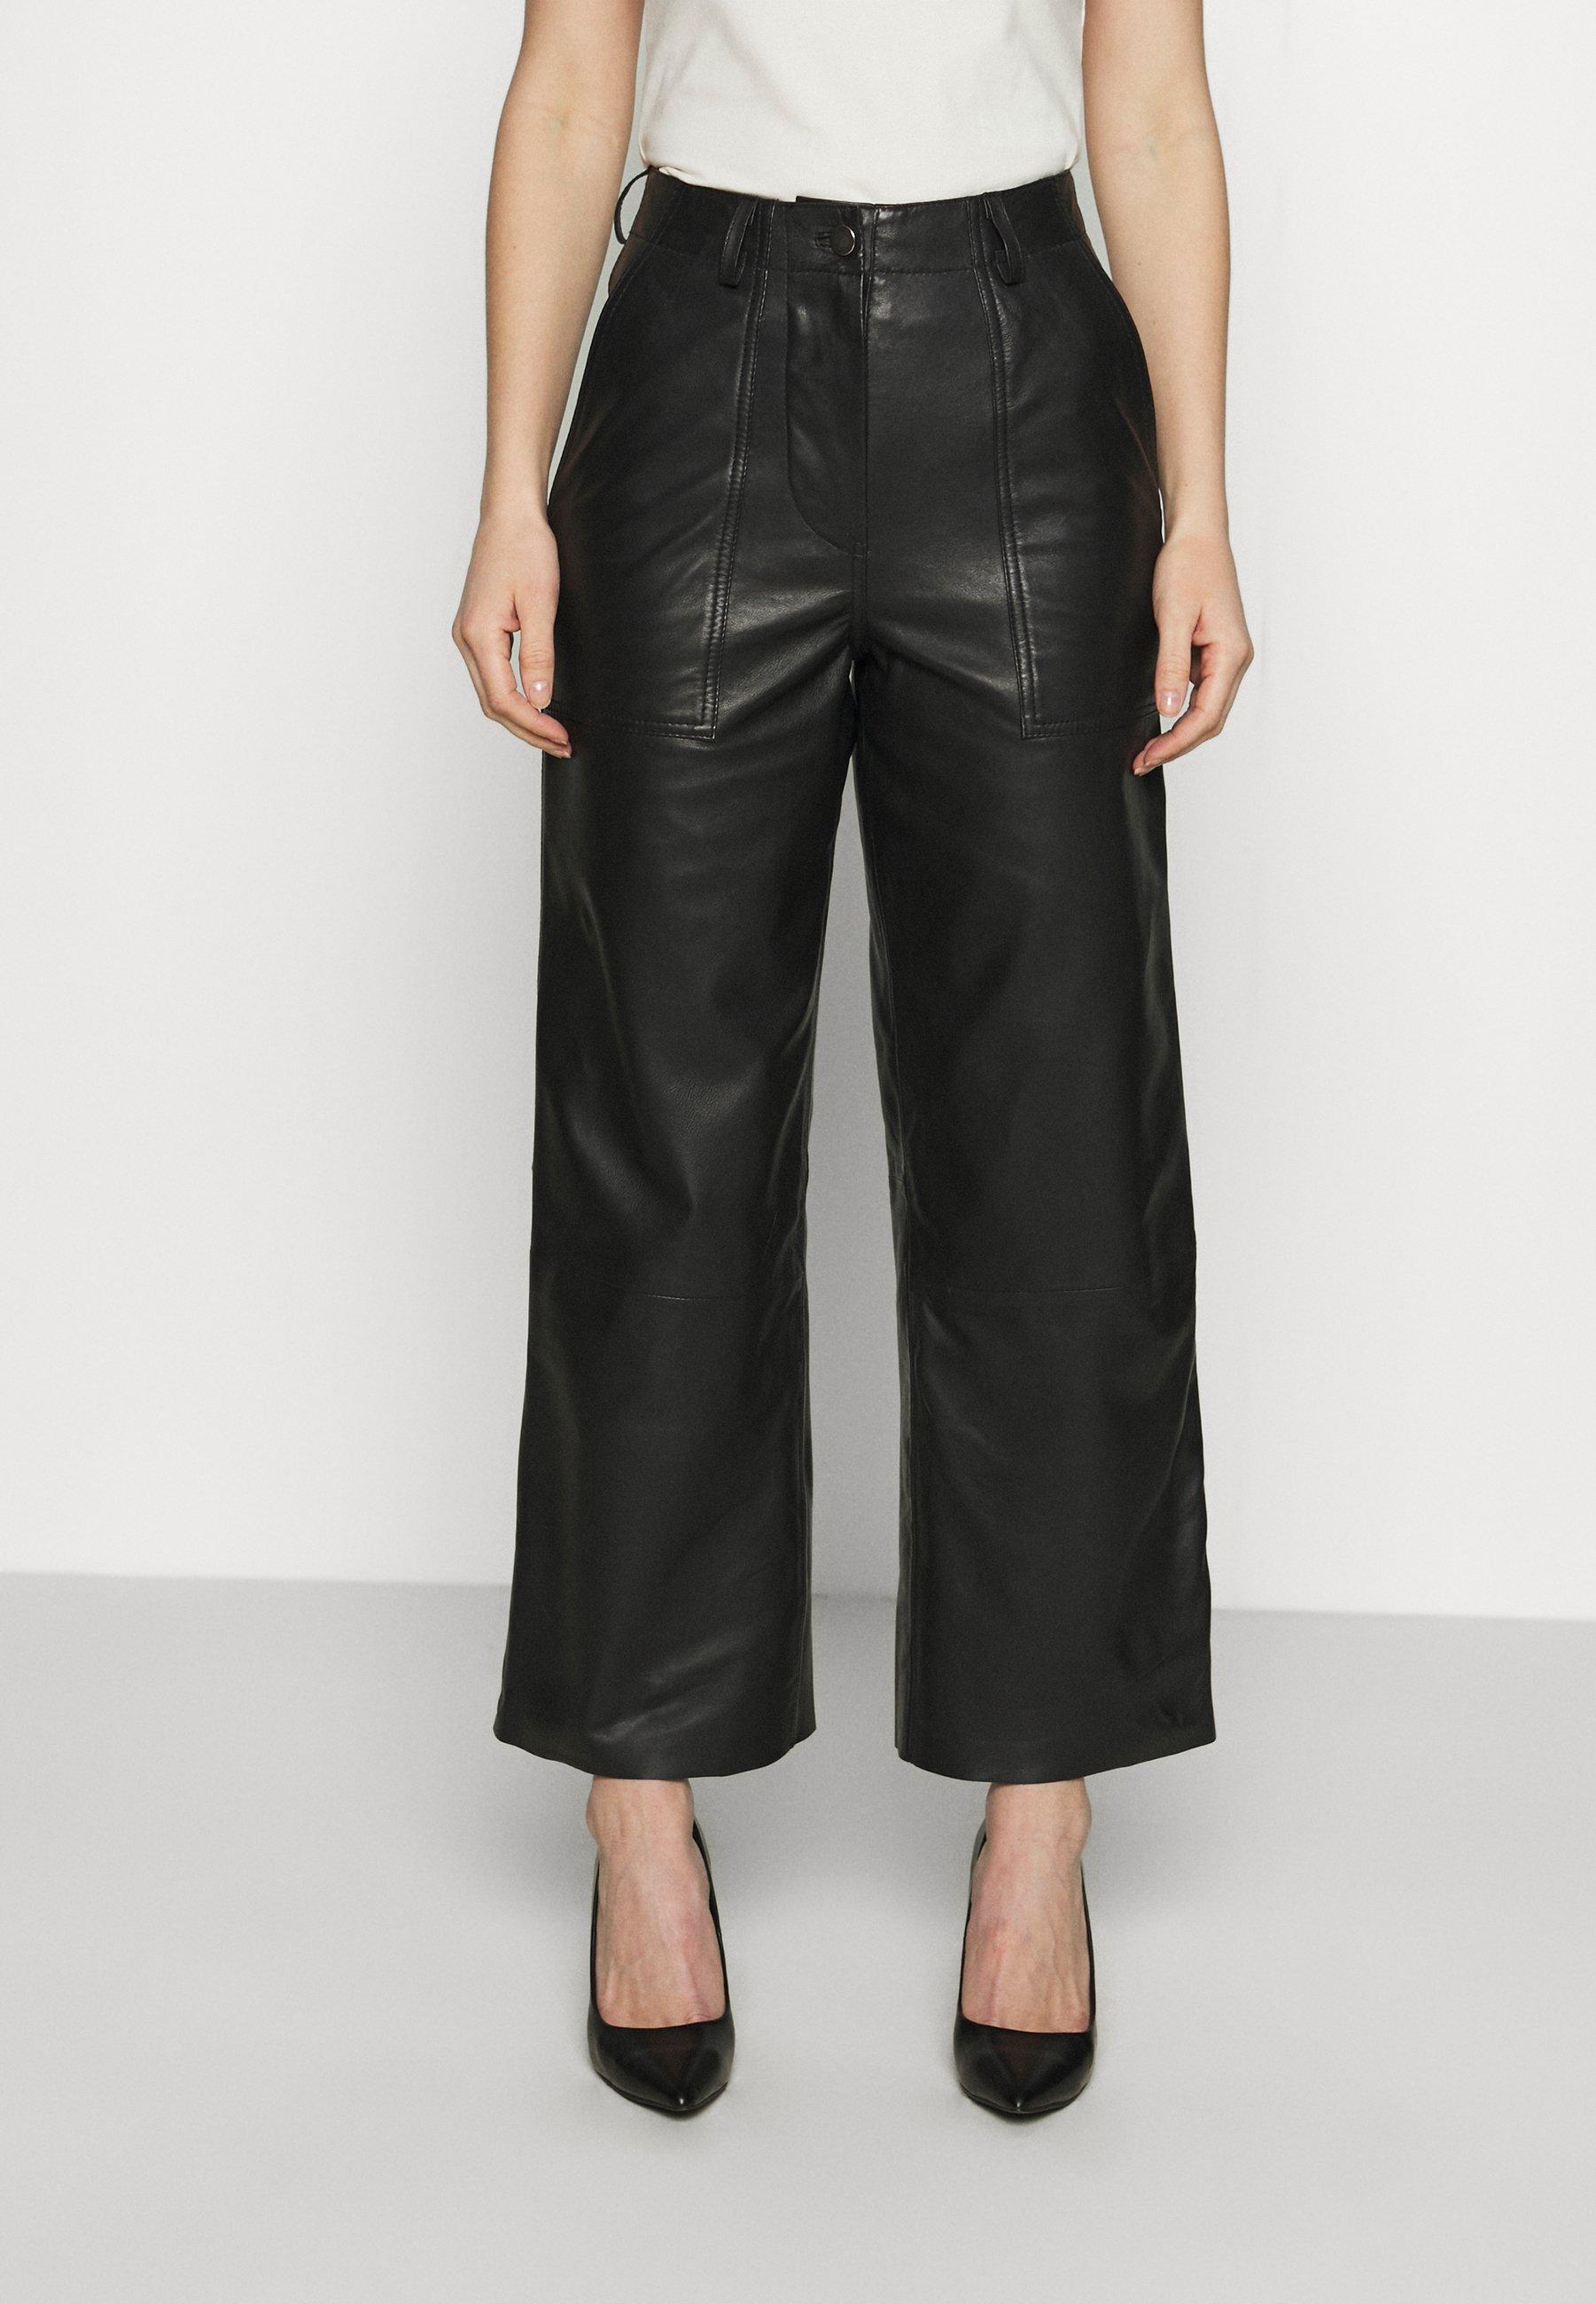 Damen PRESLEY PANTS - Lederhose